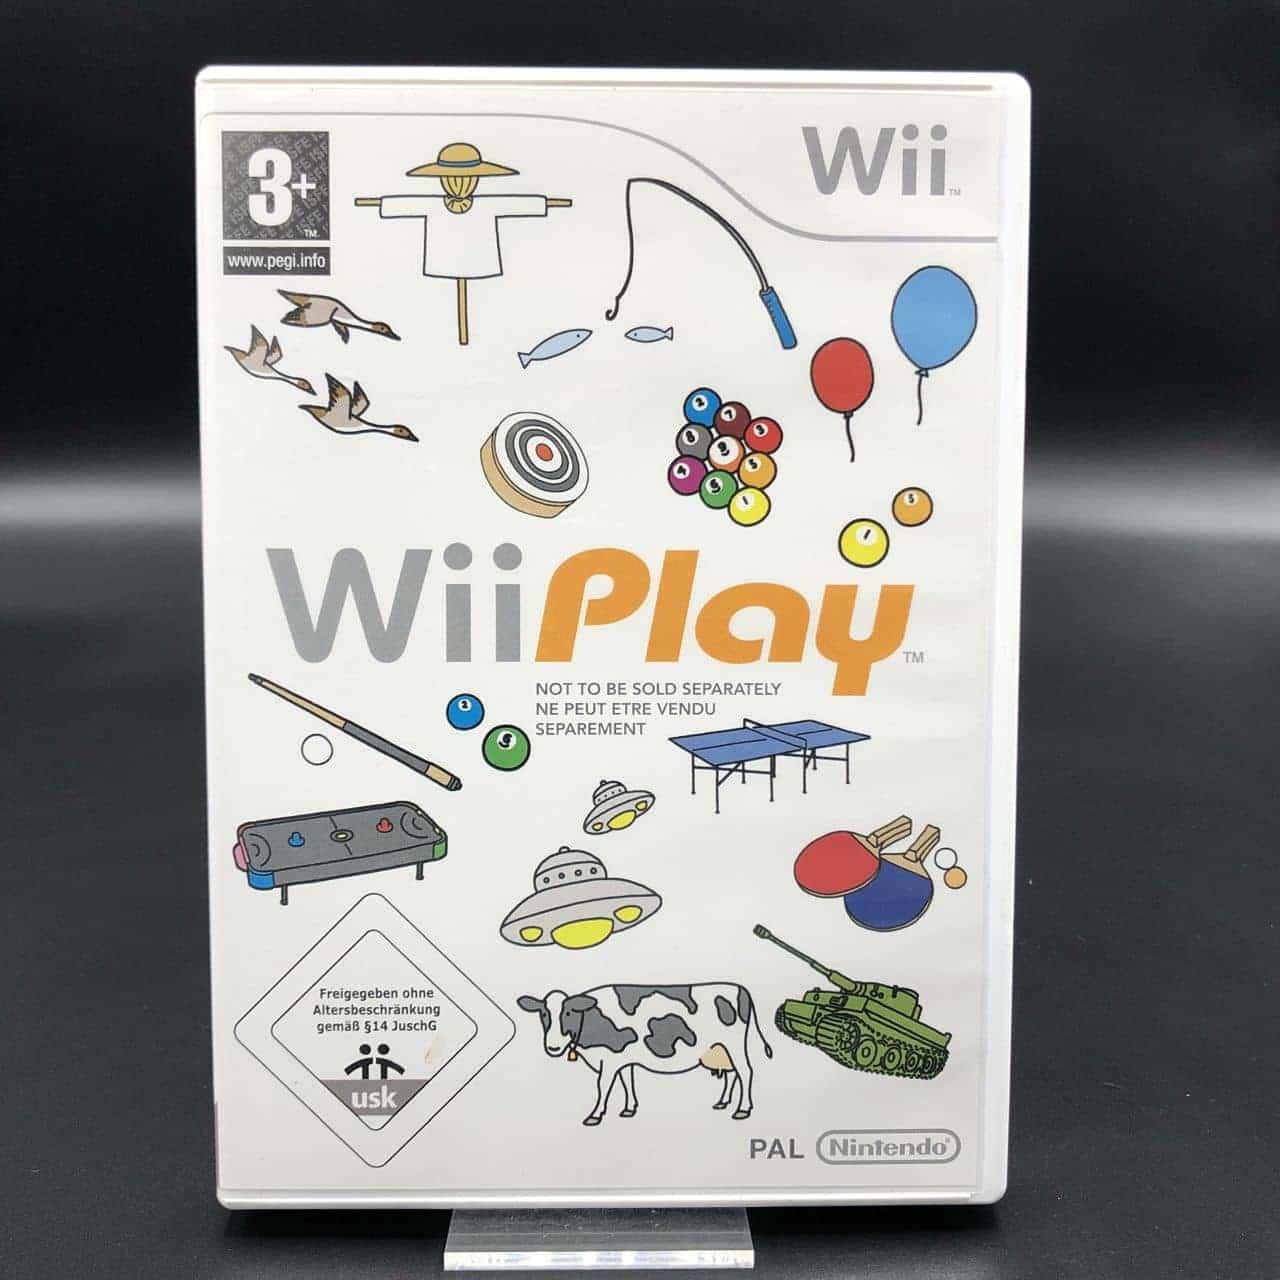 Wii Play (Komplett) (Gut) Nintendo Wii